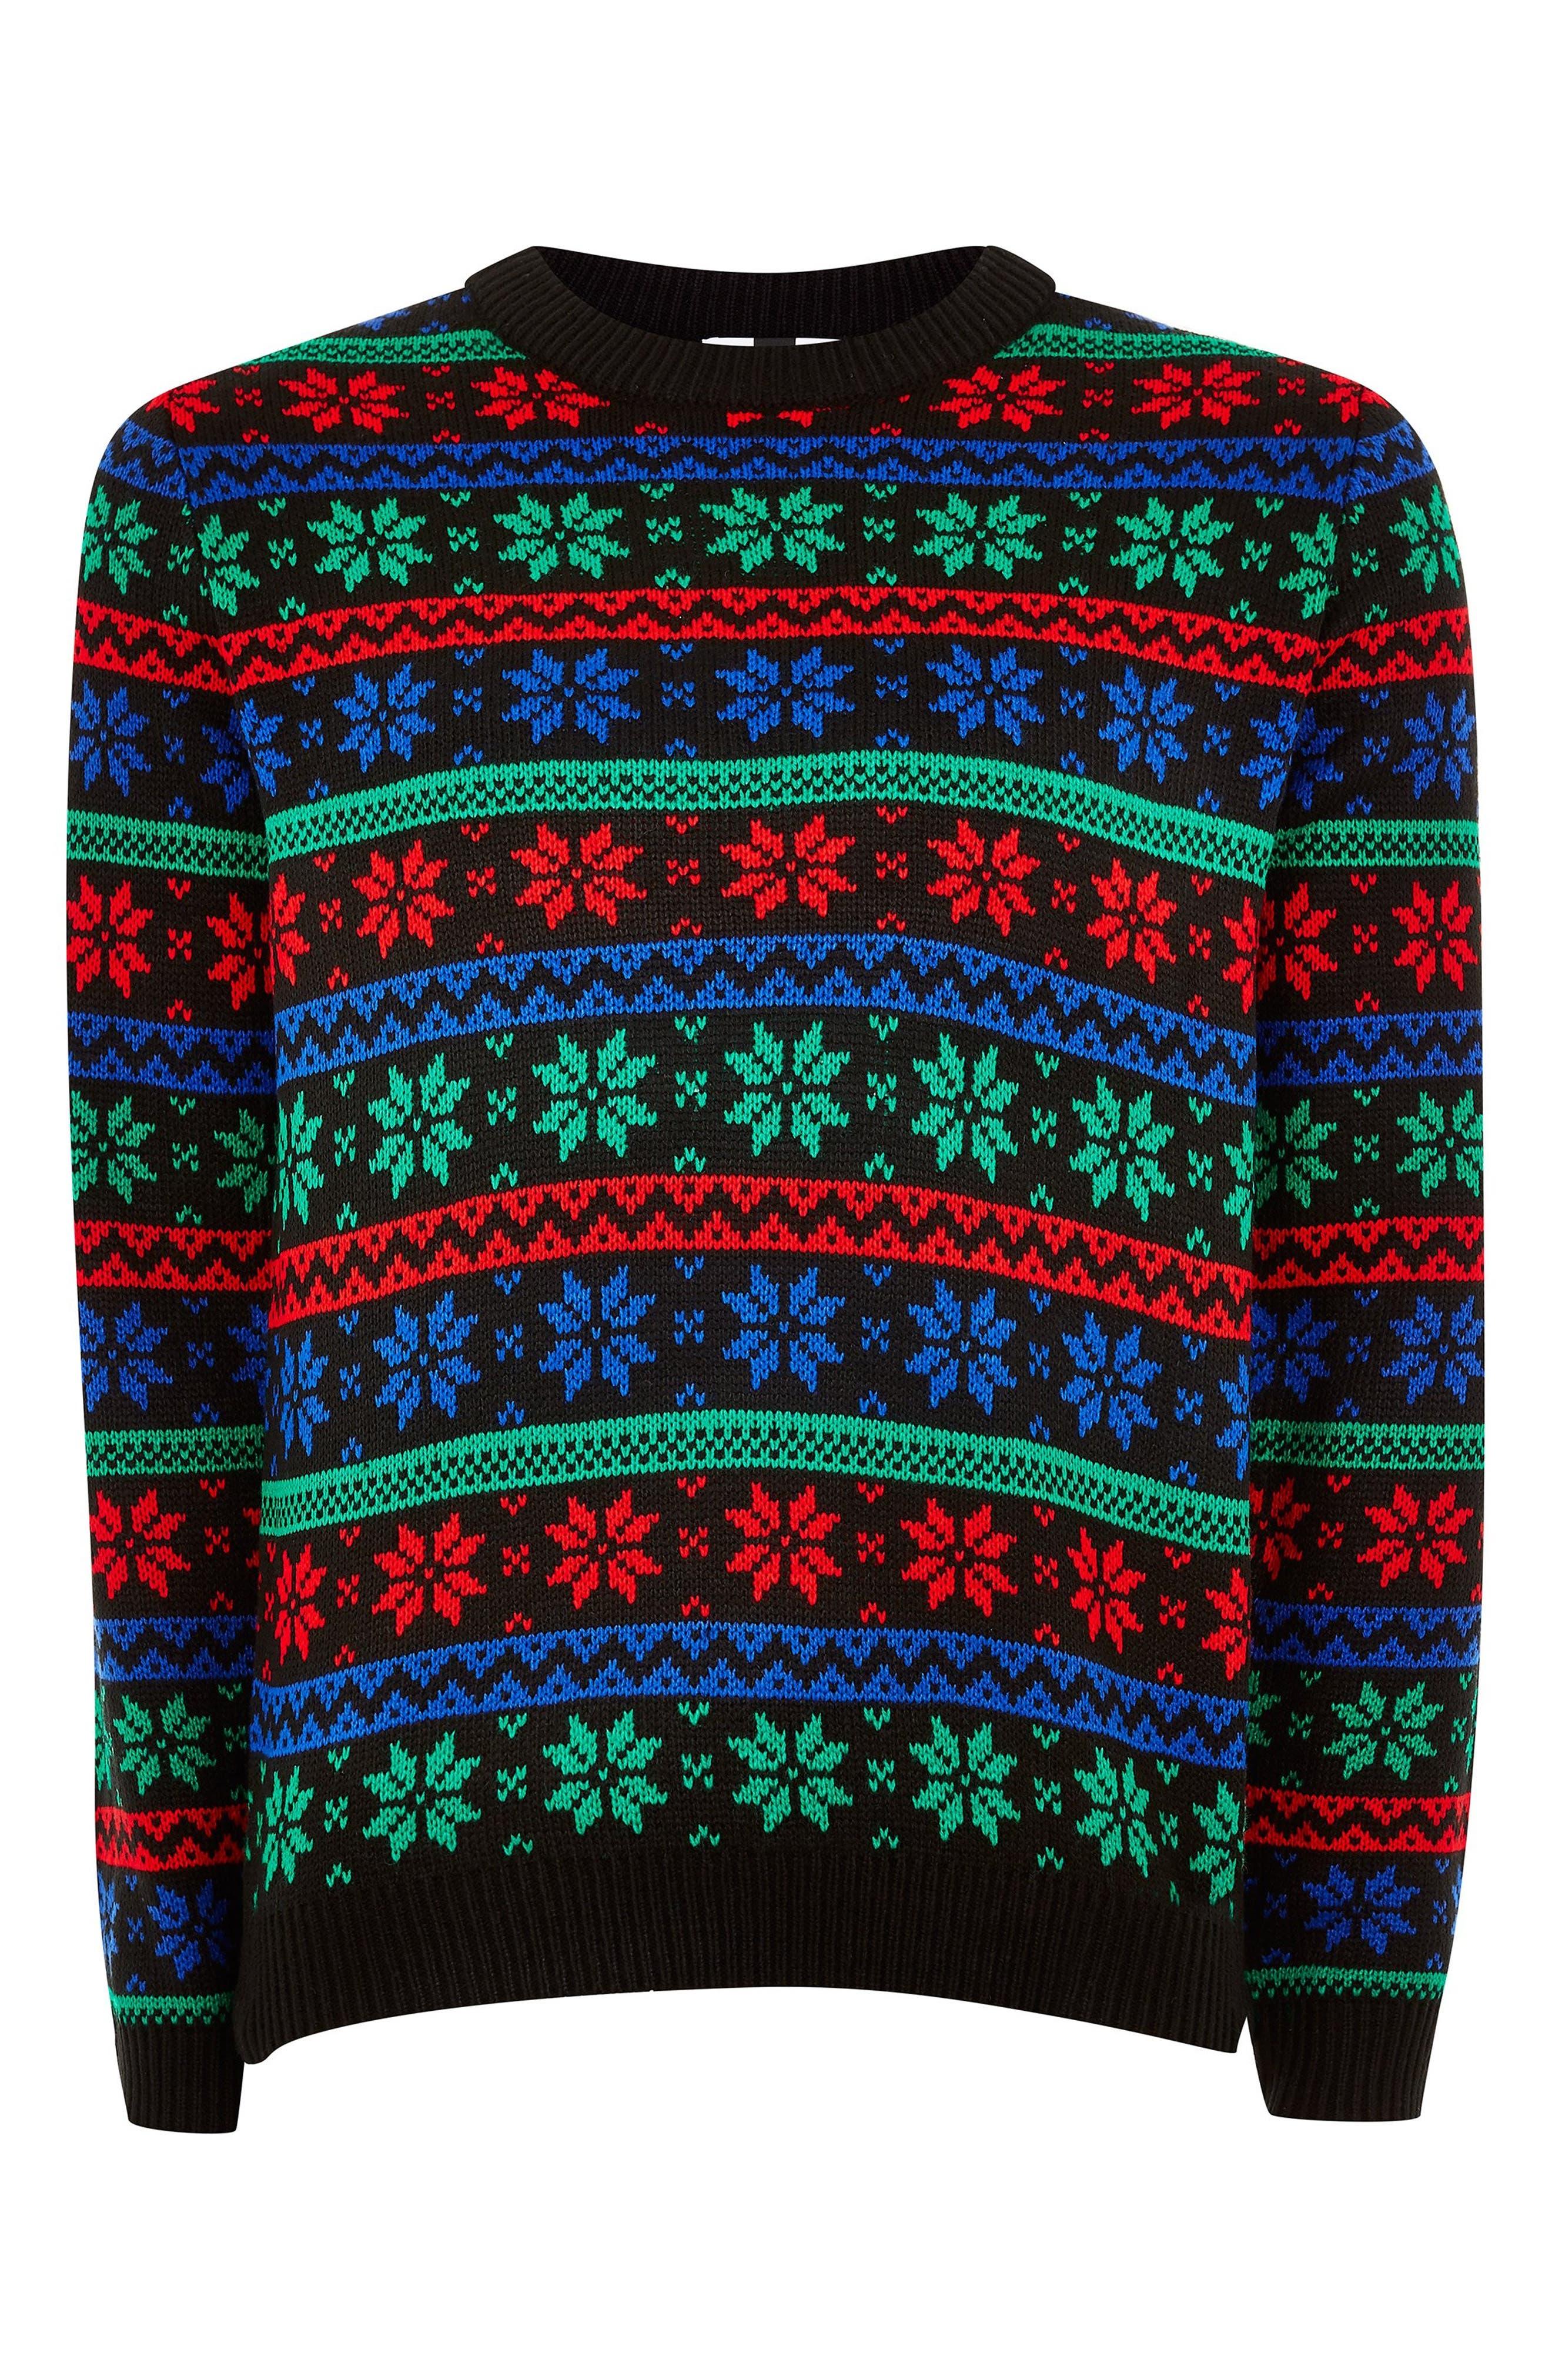 Snowflake Sweater,                             Alternate thumbnail 4, color,                             BLACK MULTI